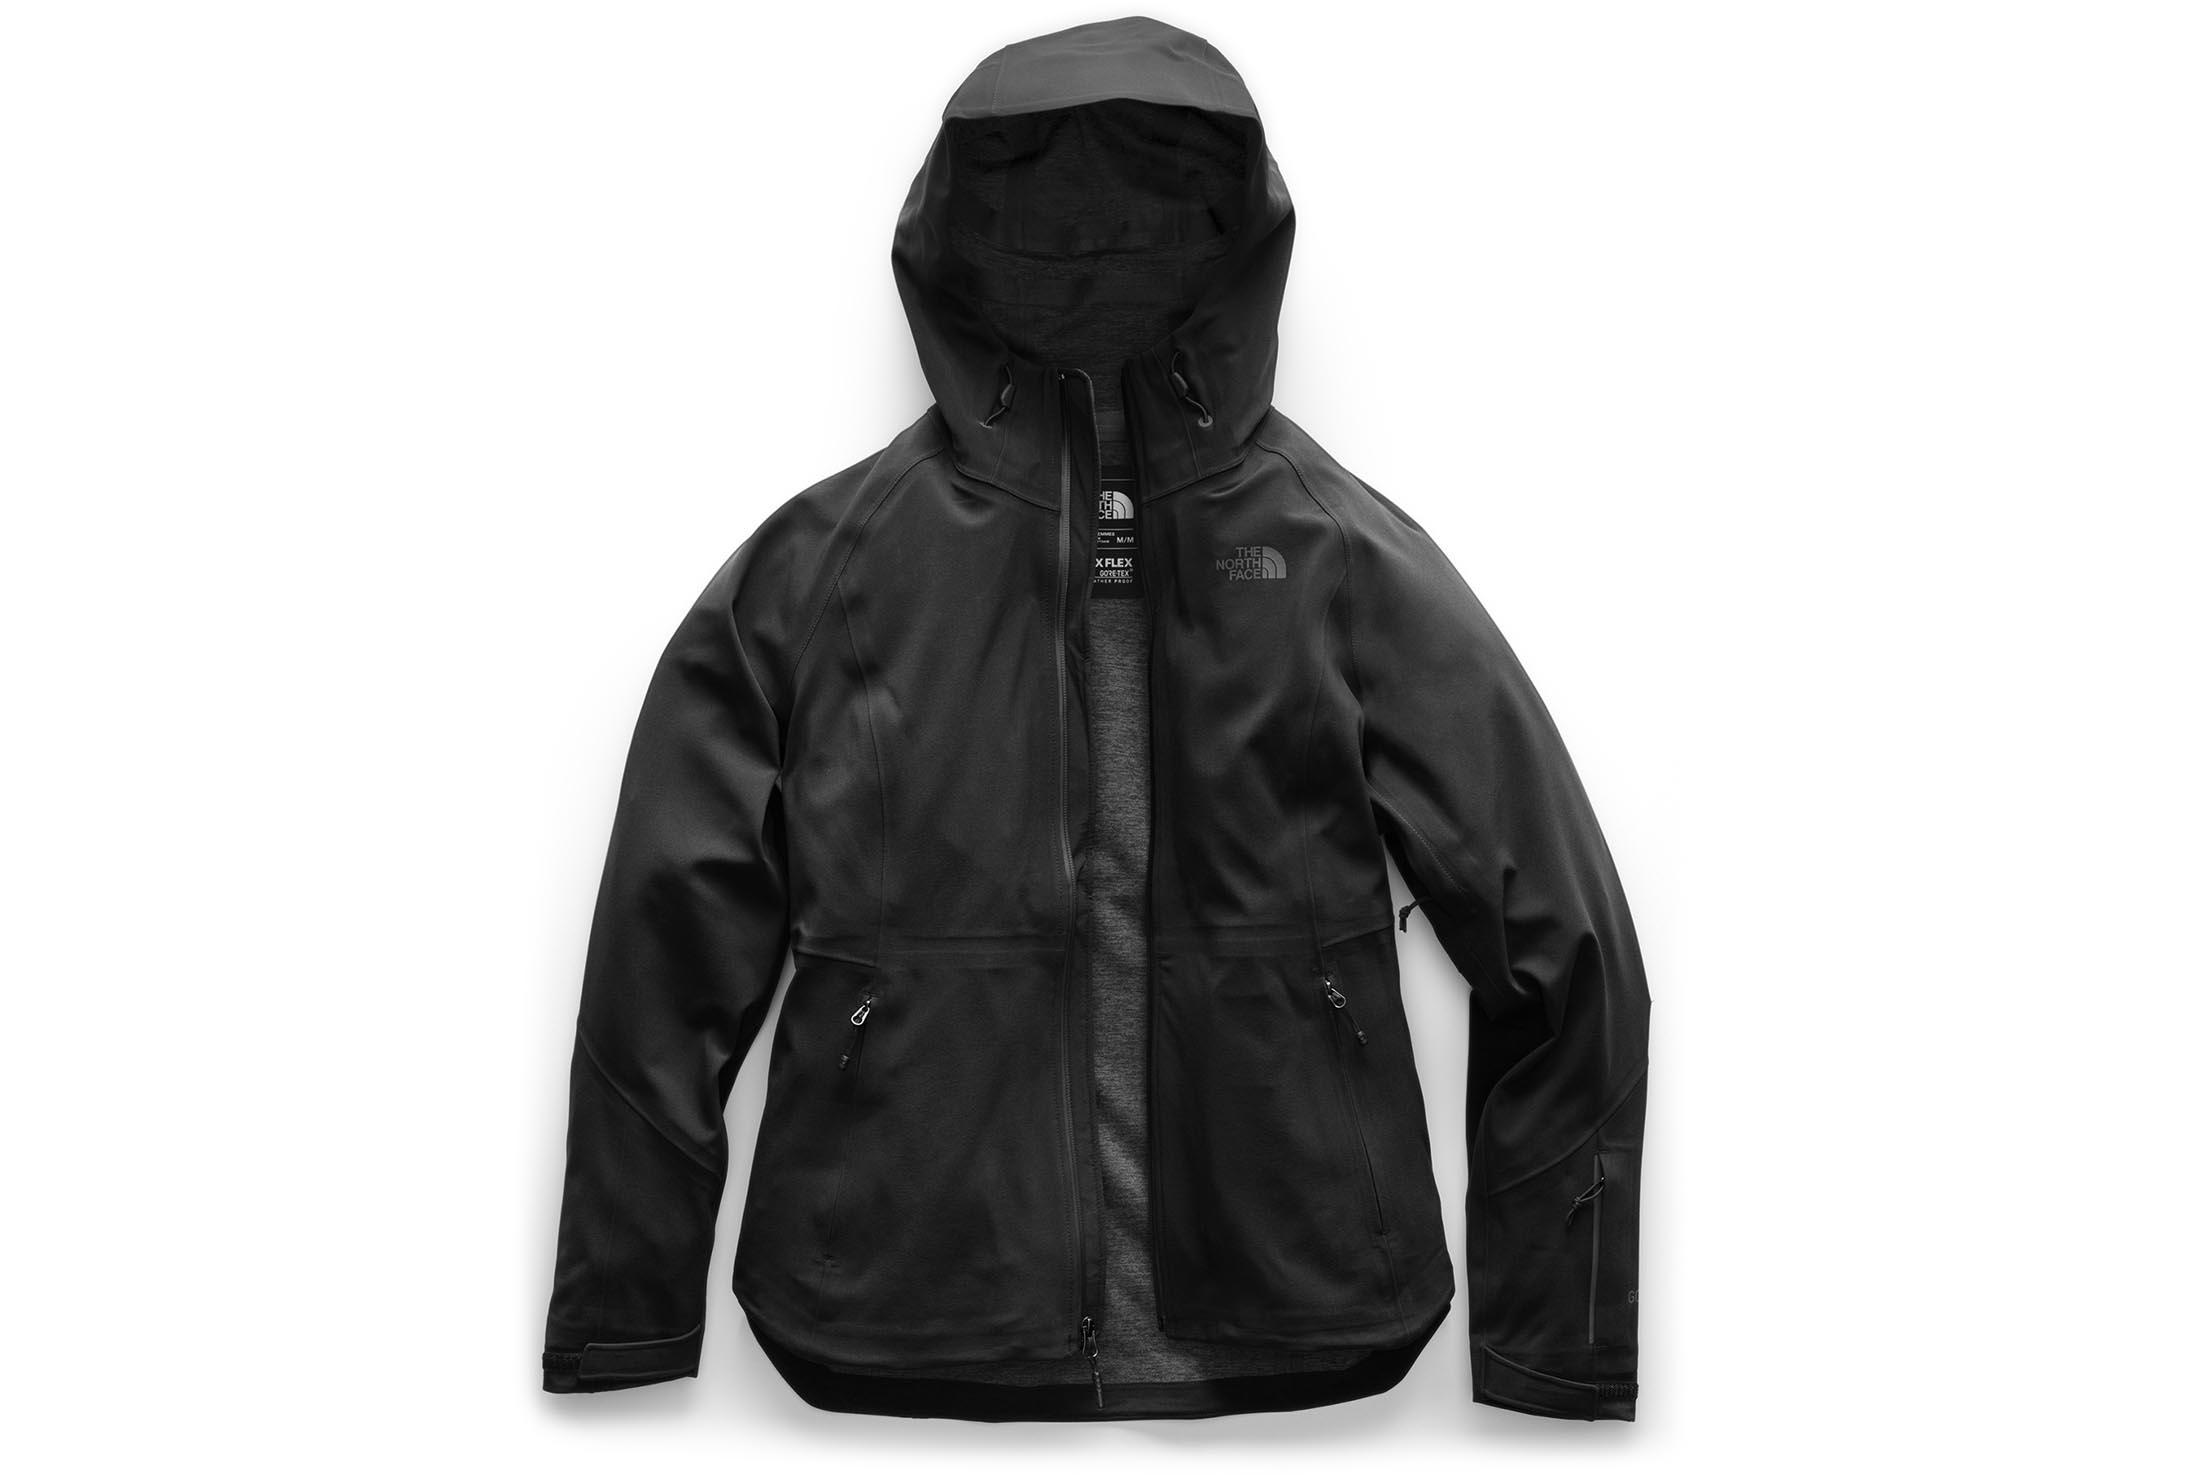 The North Face Apex Flex GTX Rain Jacket